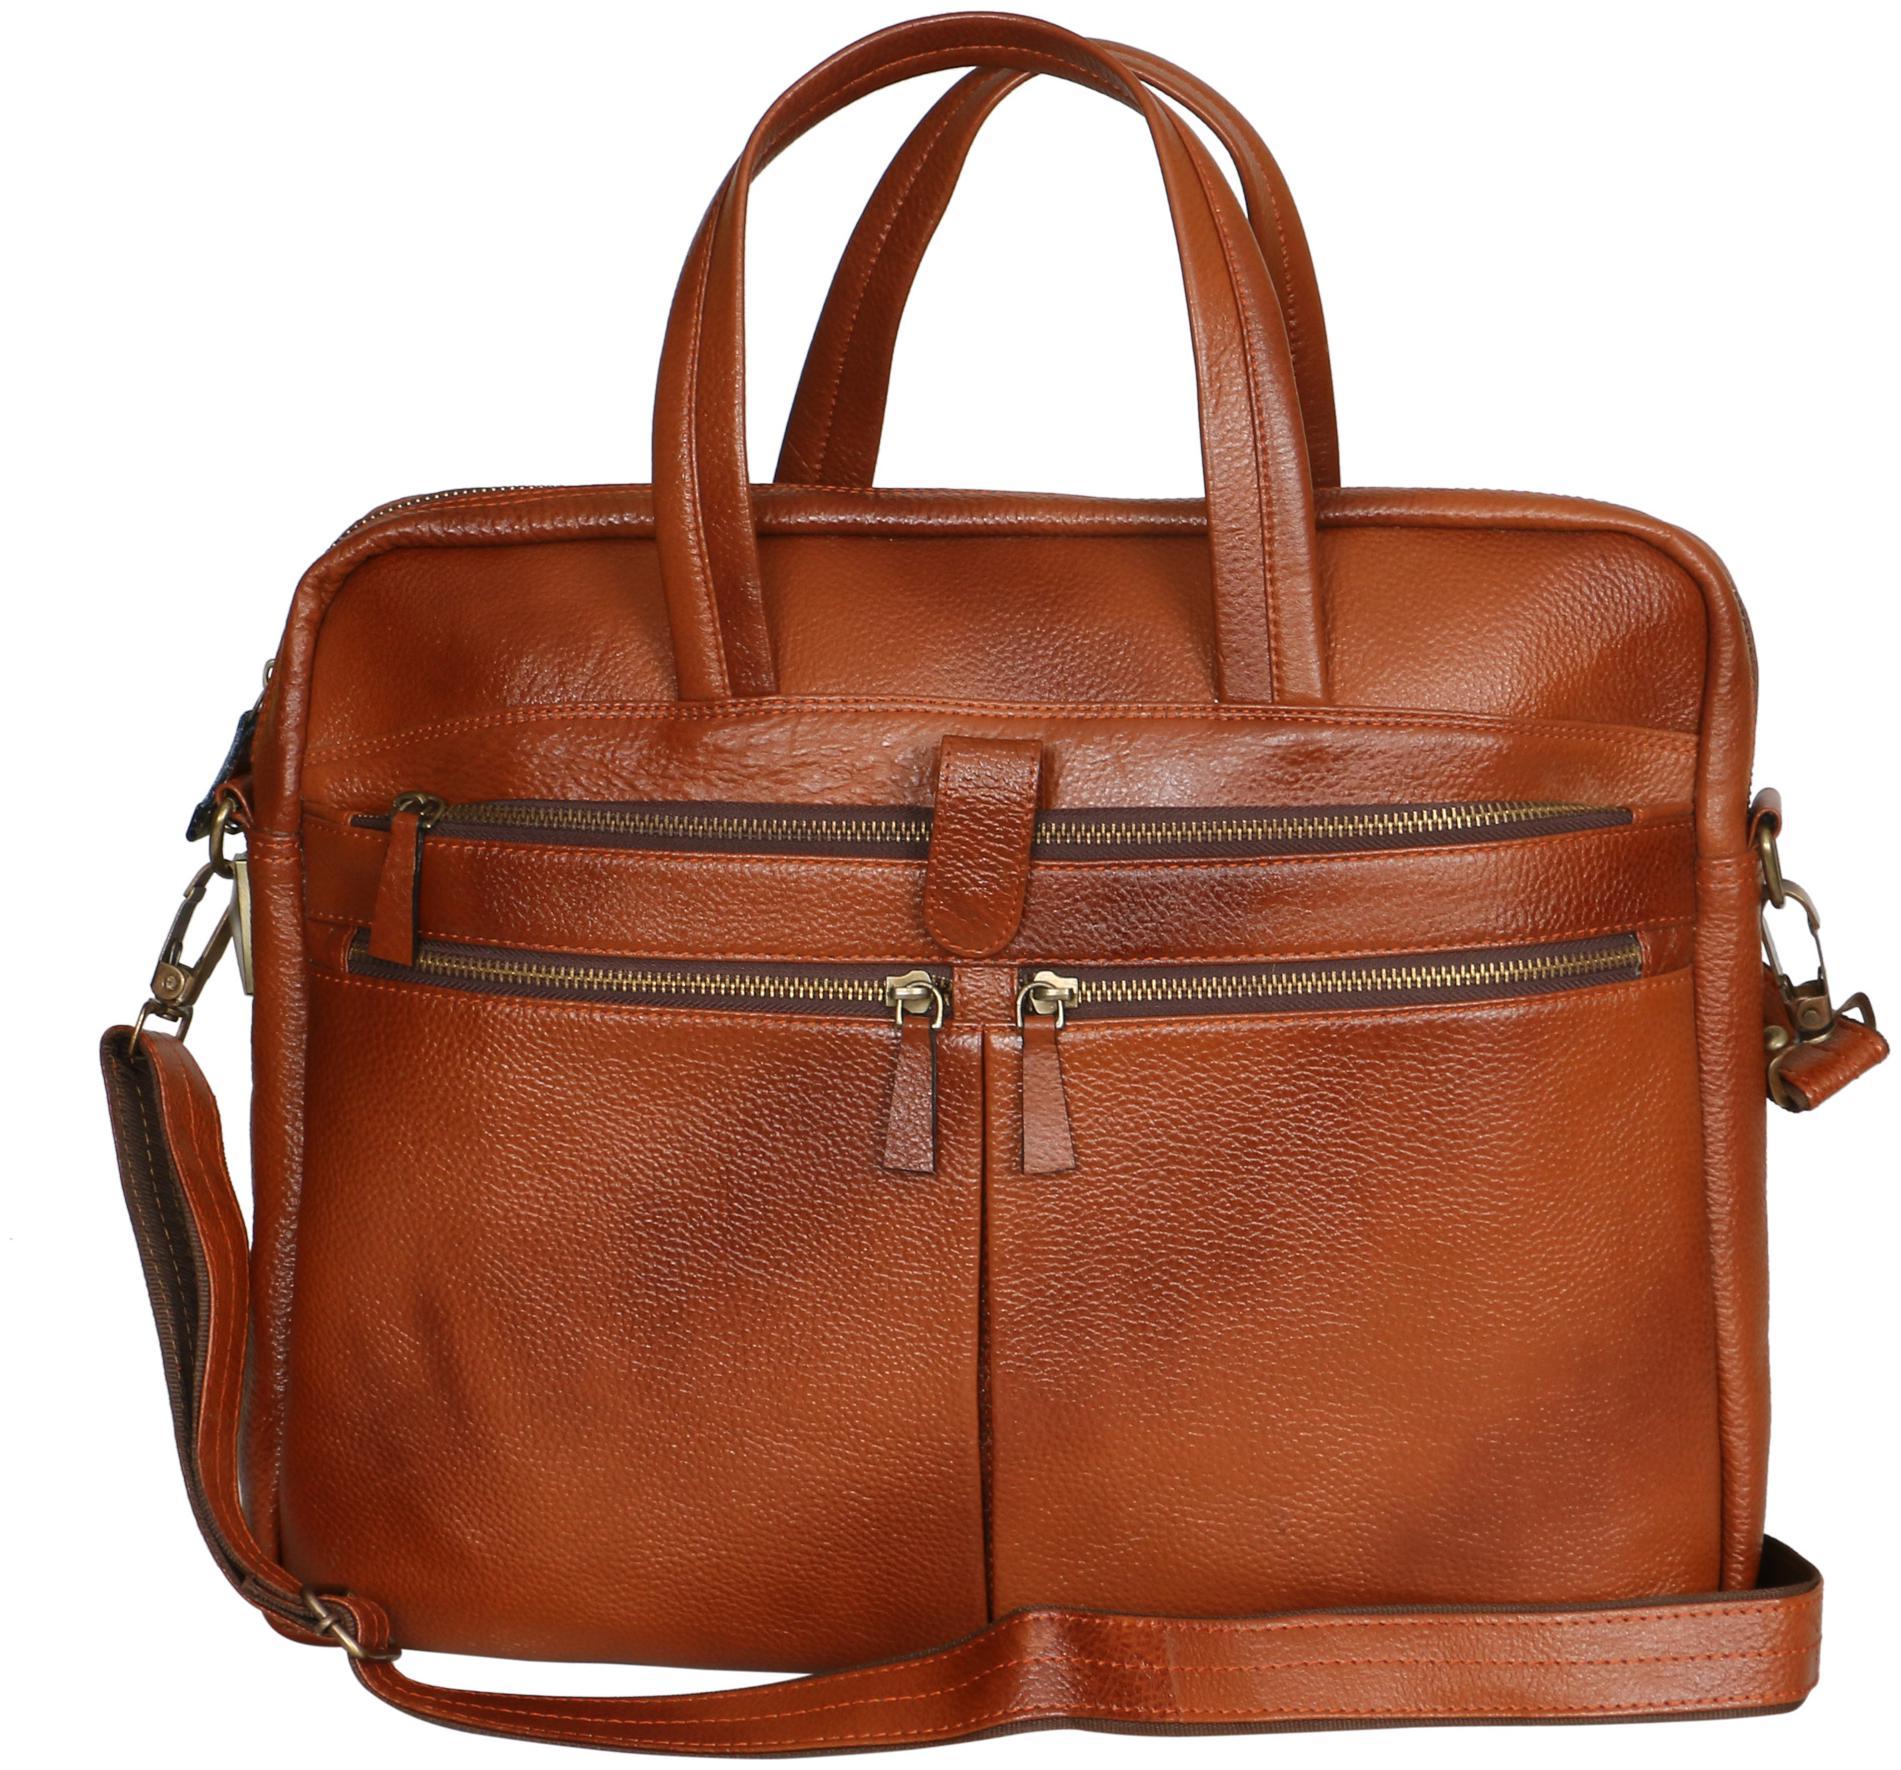 Pare Unisex 15 inch Leather Laptop Messenger Bag by PARE